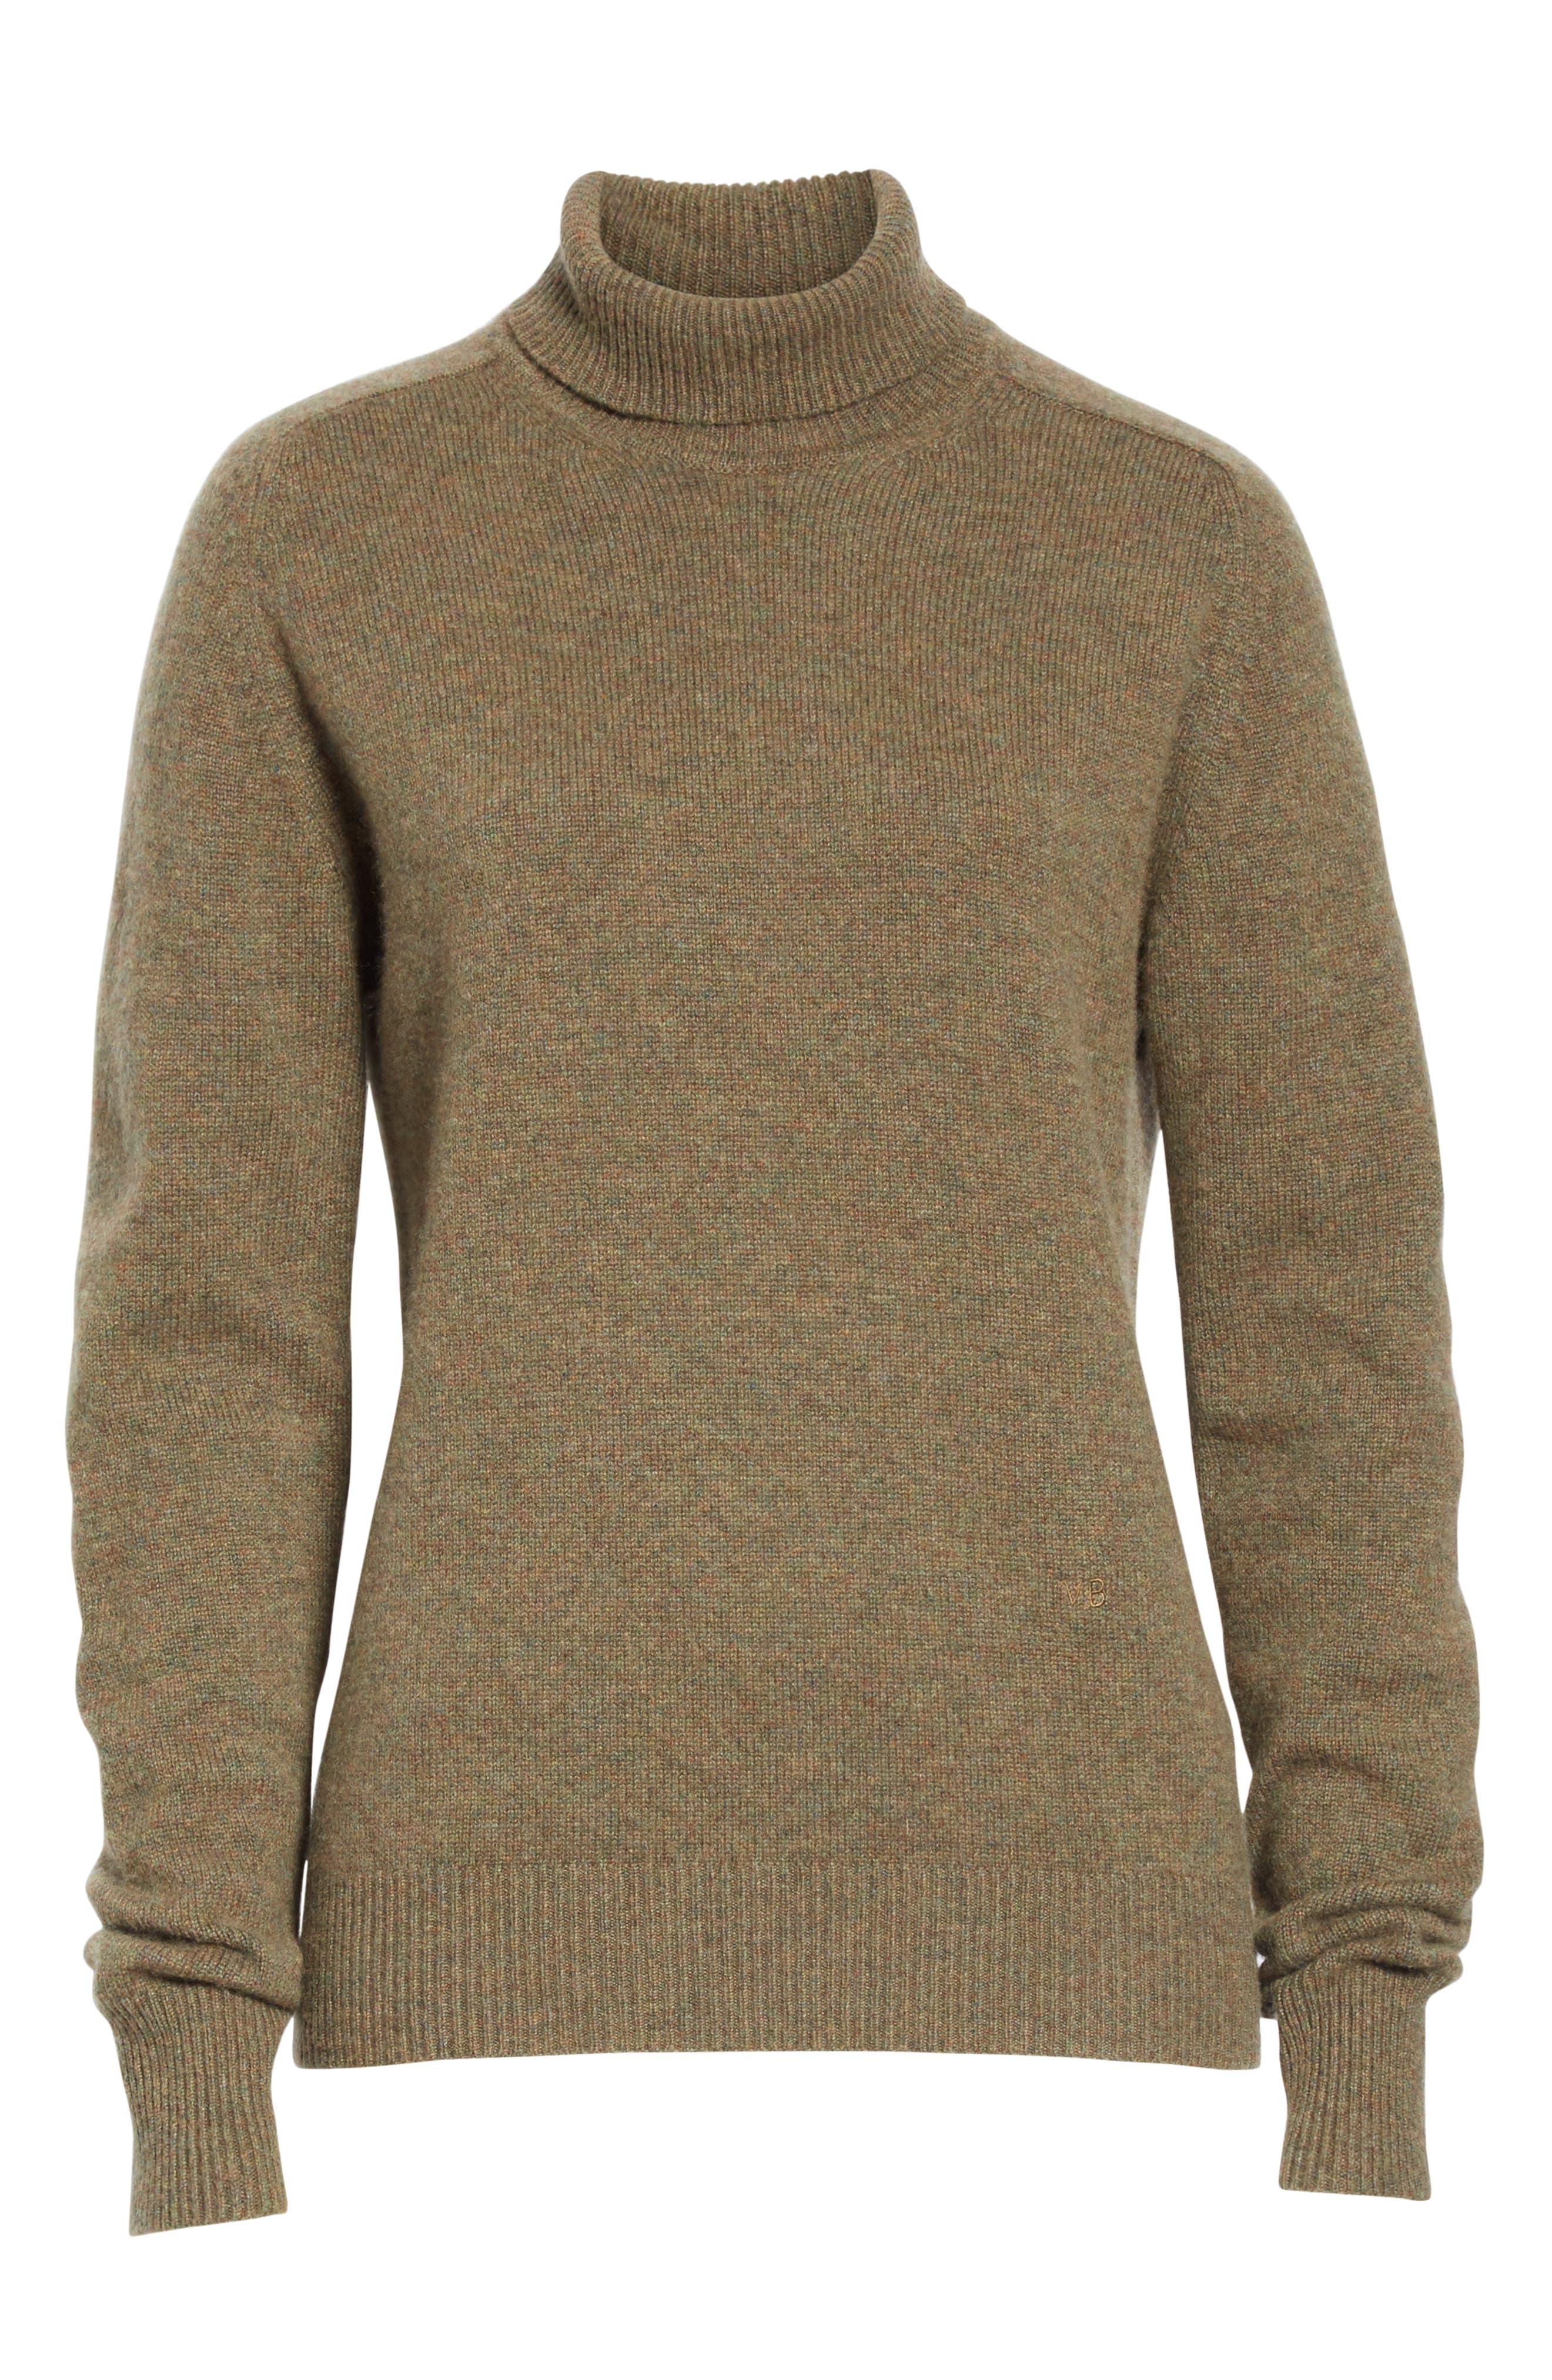 VICTORIA BECKHAM, Stretch Cashmere Turtleneck Sweater, Alternate thumbnail 7, color, OLIVE